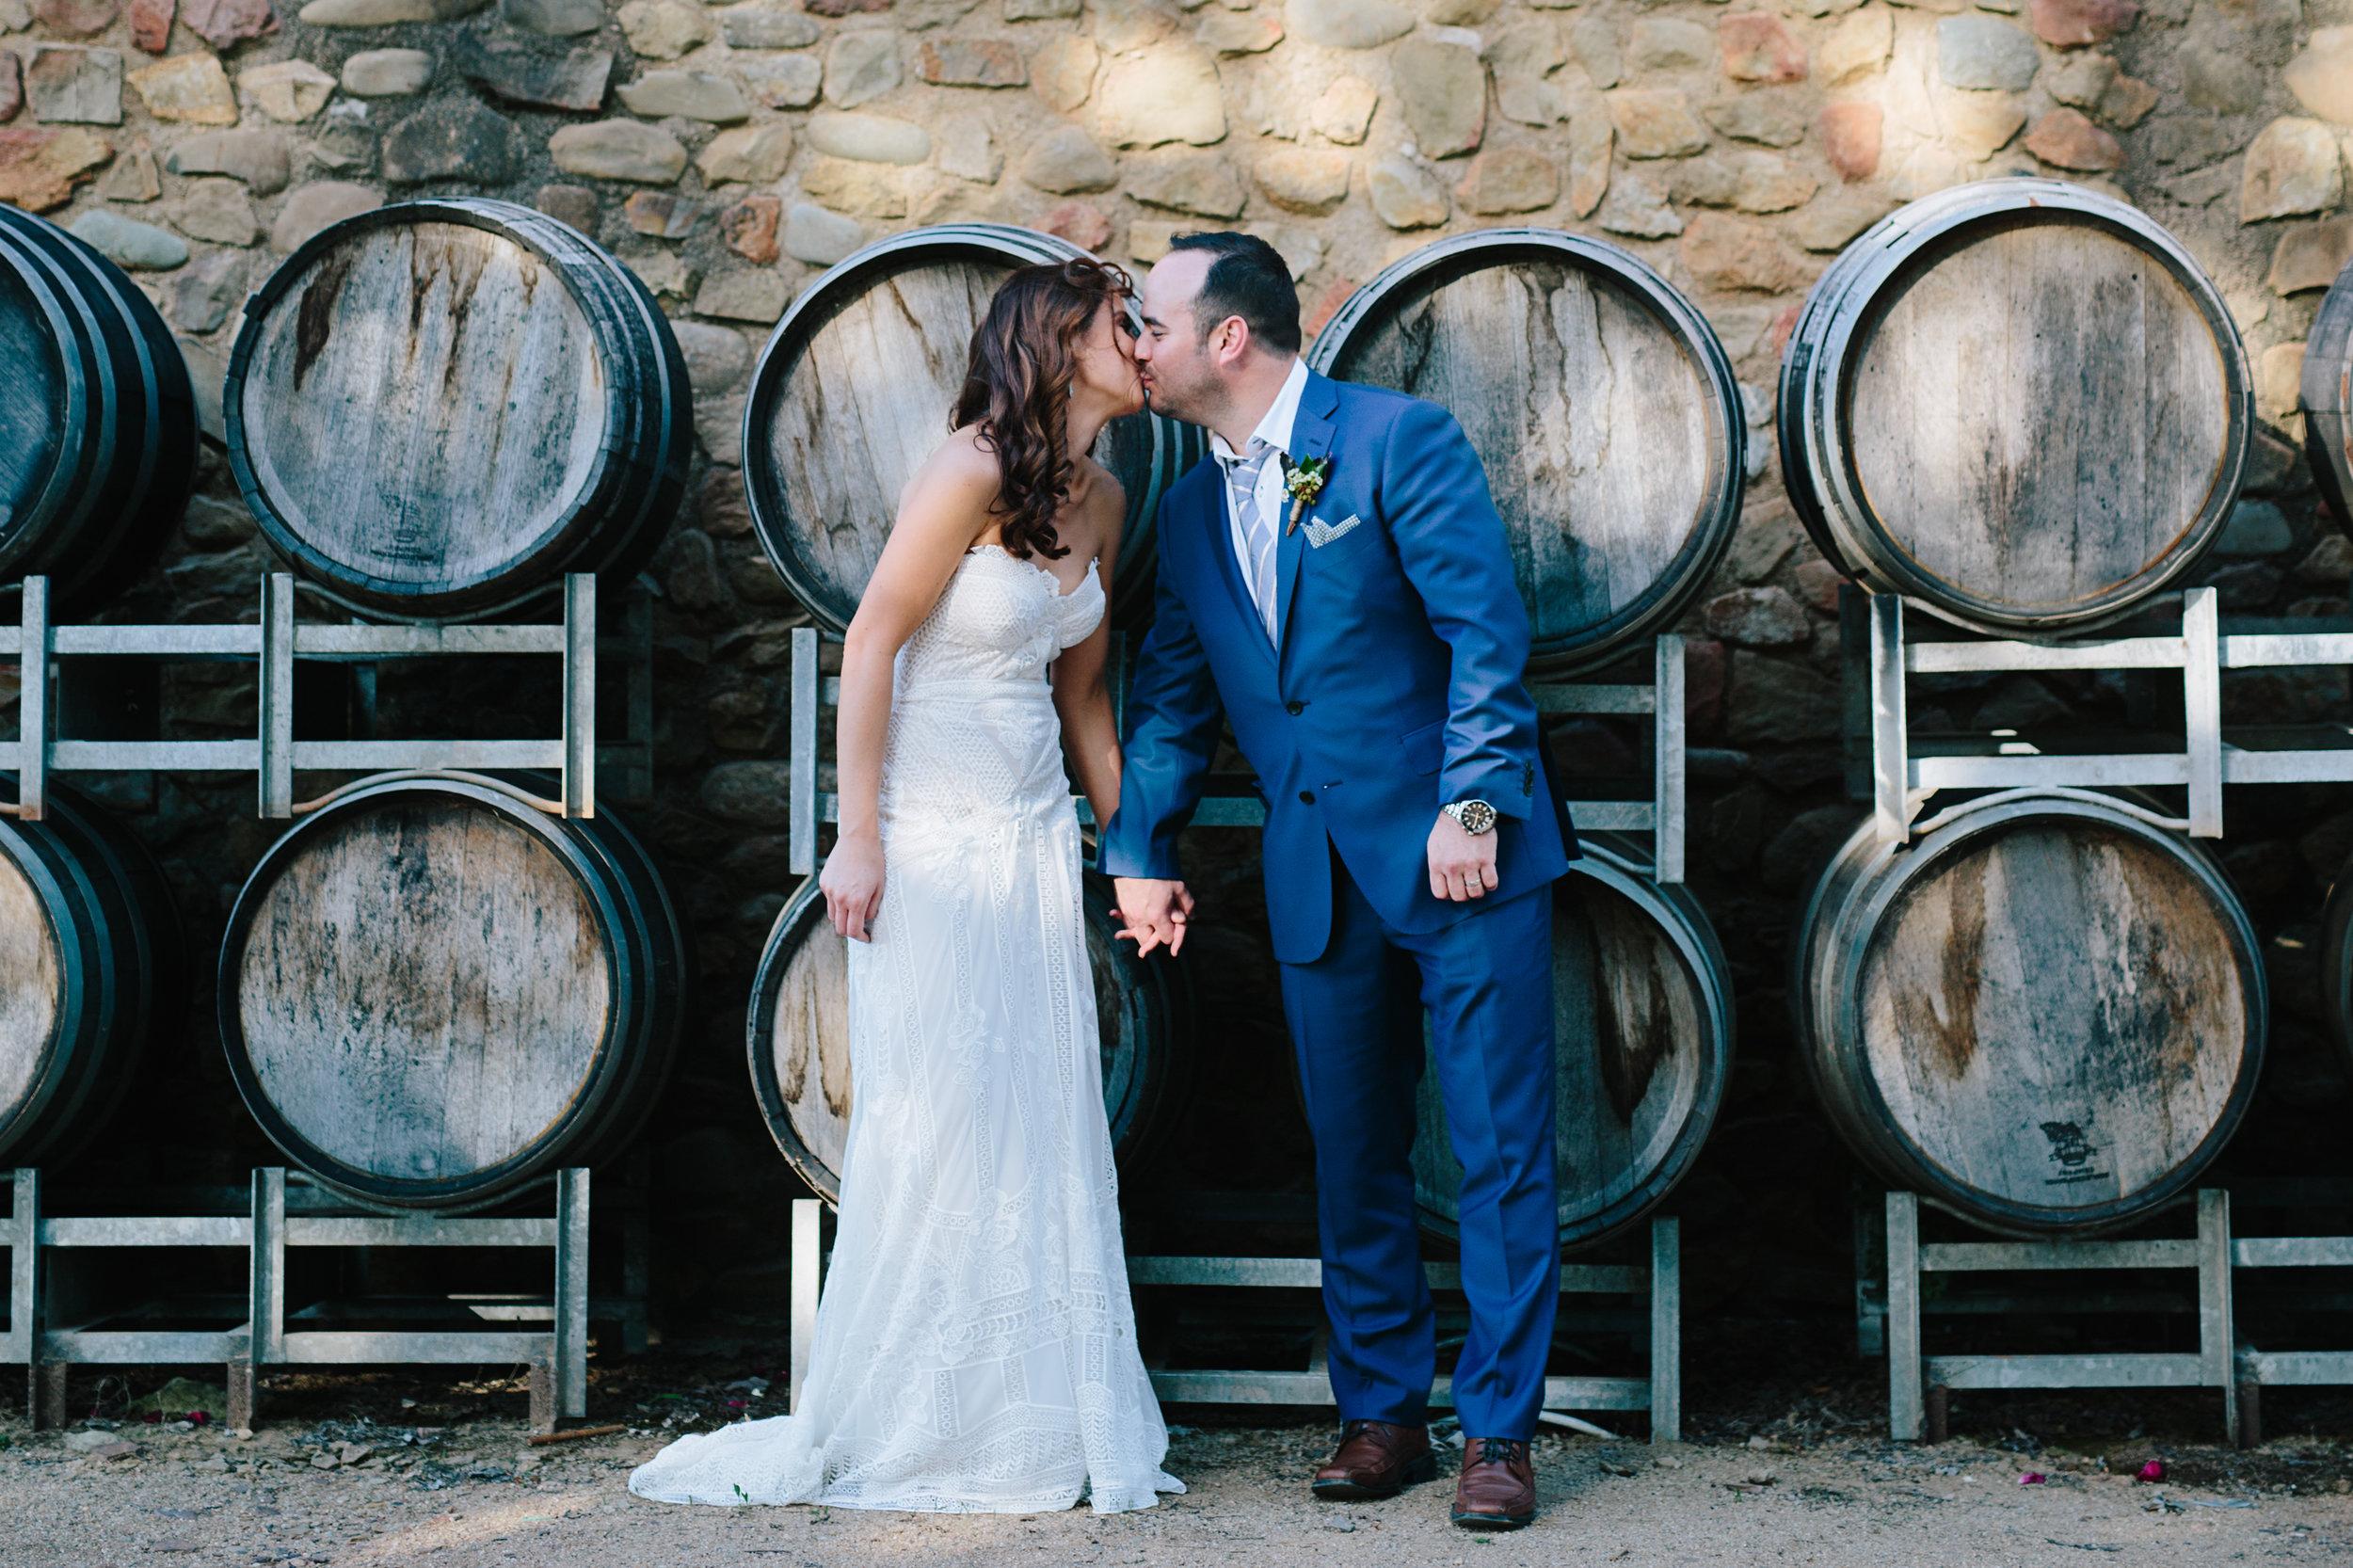 Natalie and Chris - Feathertop Winery, Porpunkah